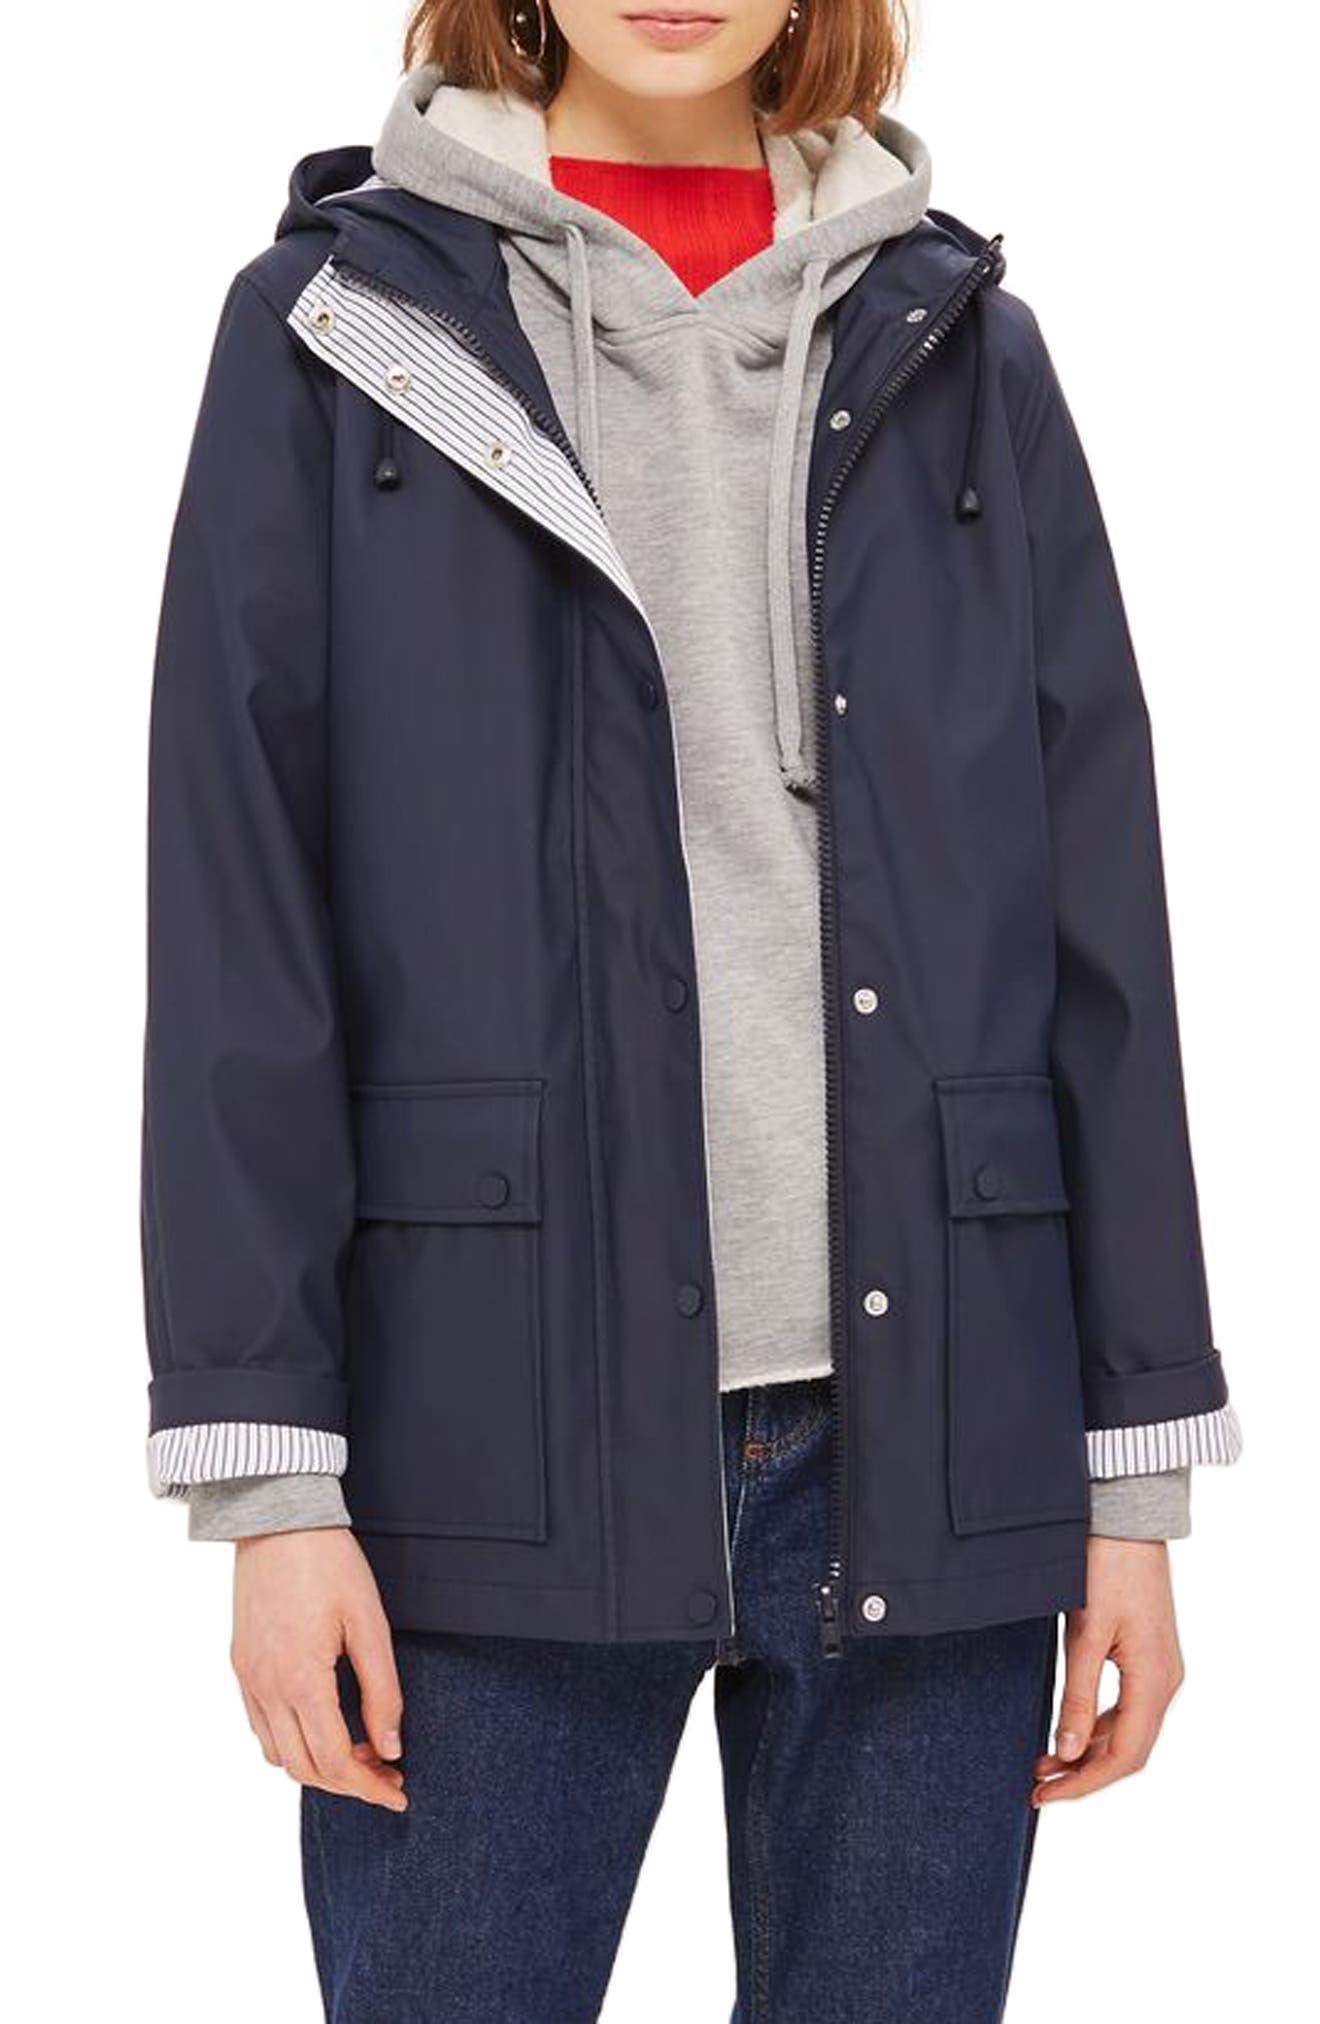 Maisie Rain Jacket,                         Main,                         color, Navy Blue